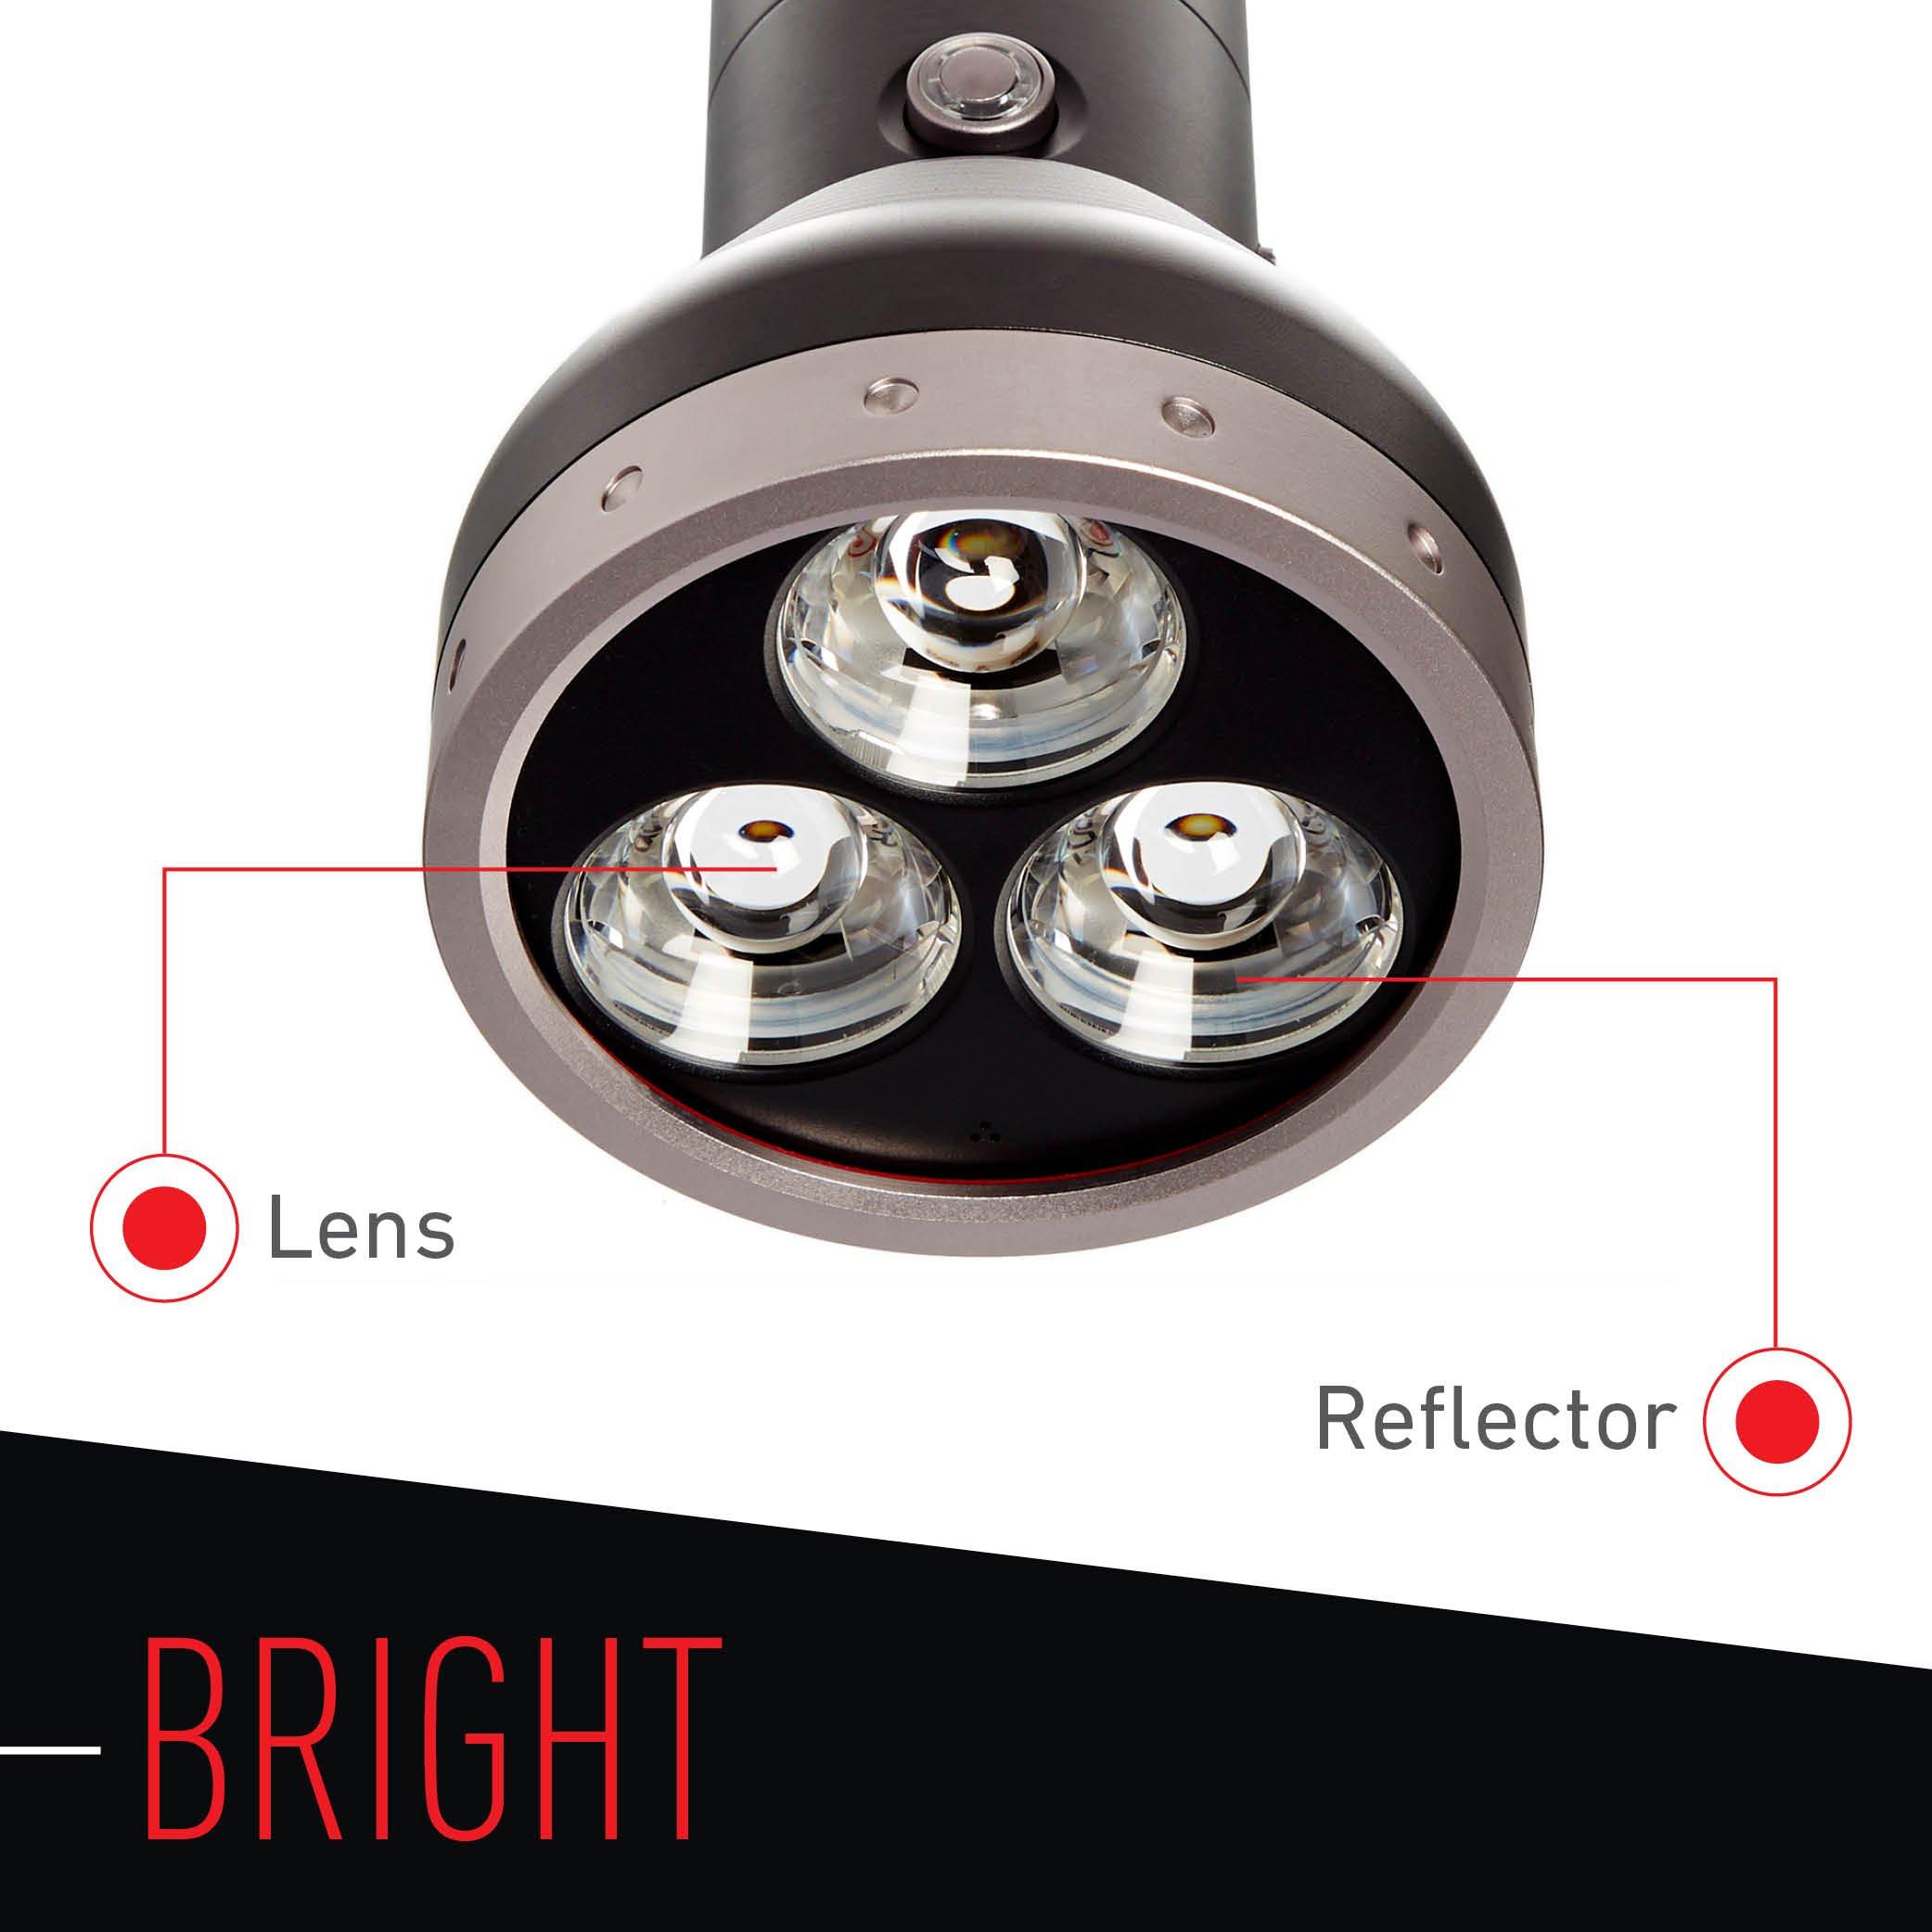 Led Lenser - 3000 Lumens, MT18 Flashlight with Rapid Focus System by LED Lenser (Image #2)